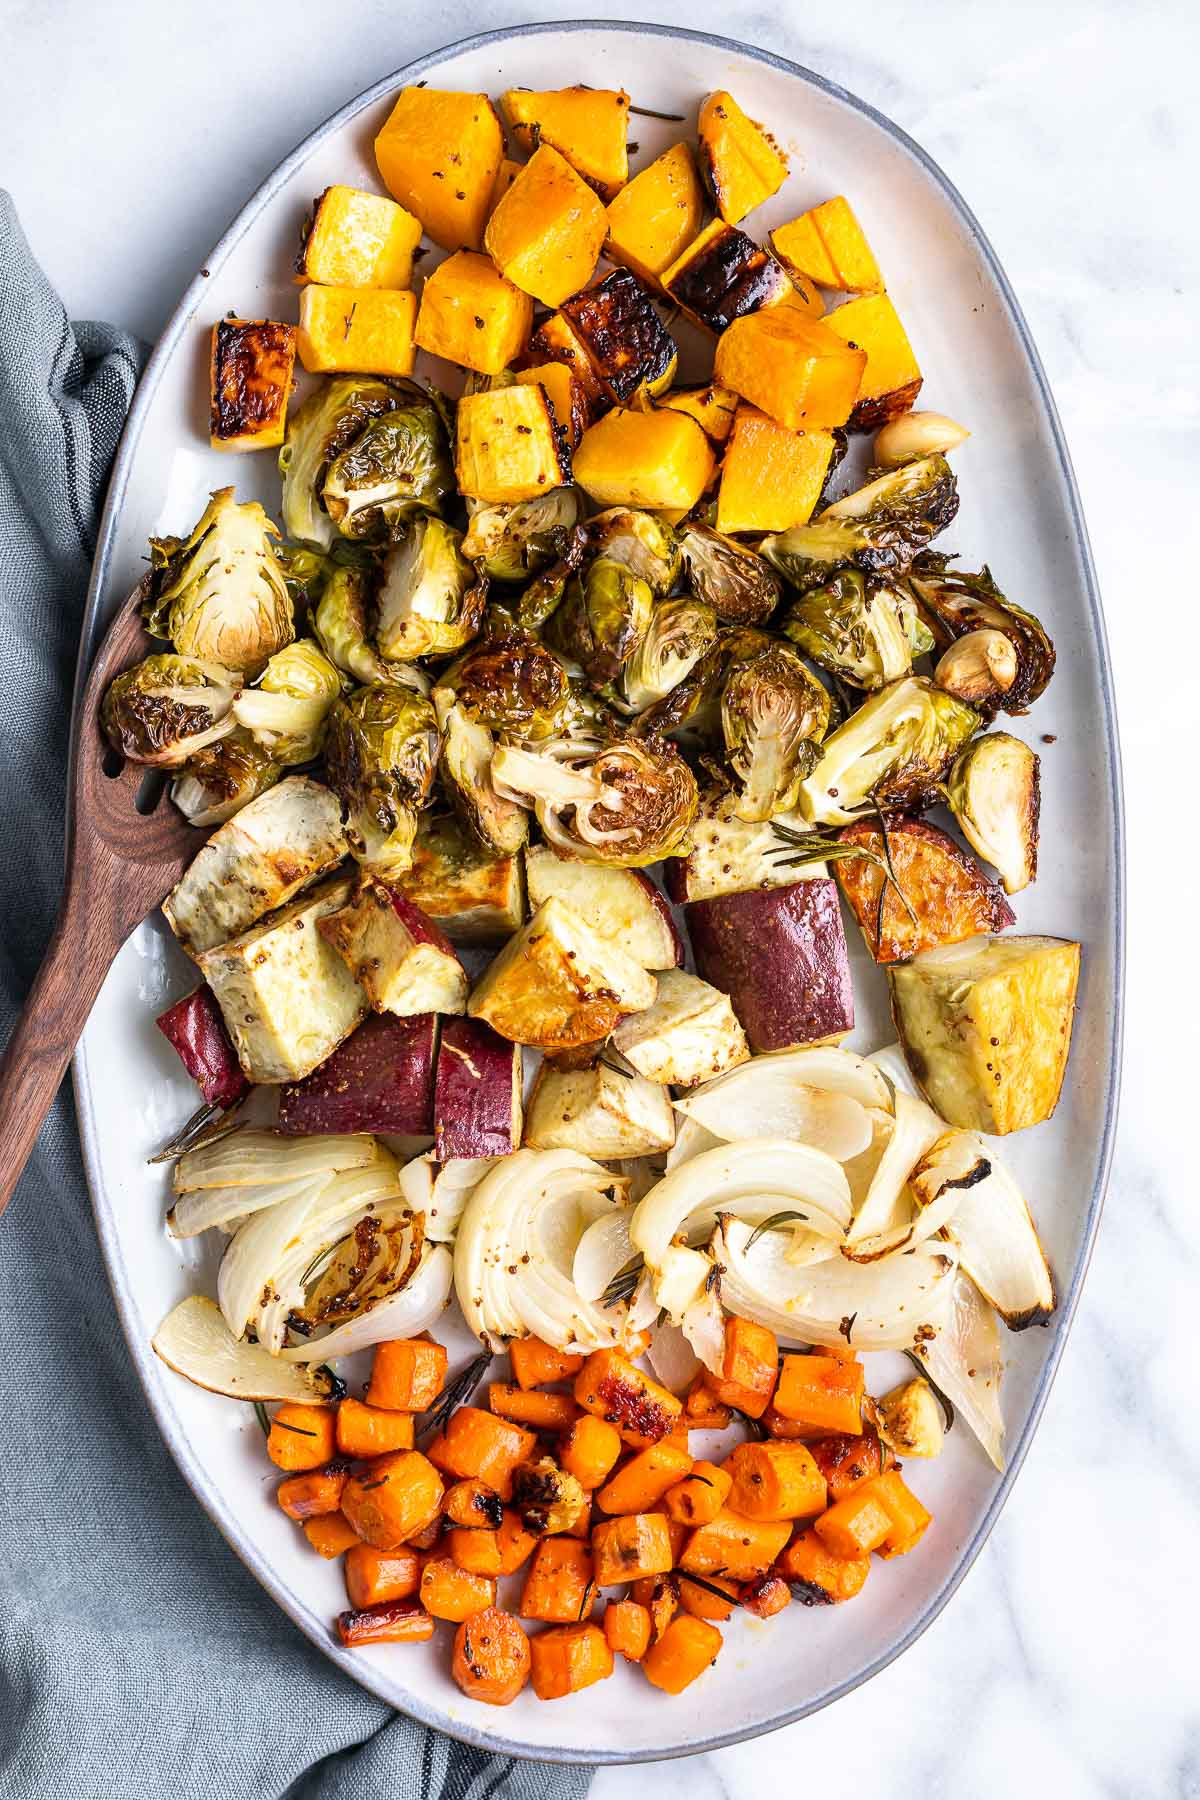 oven roasted vegetables on platter